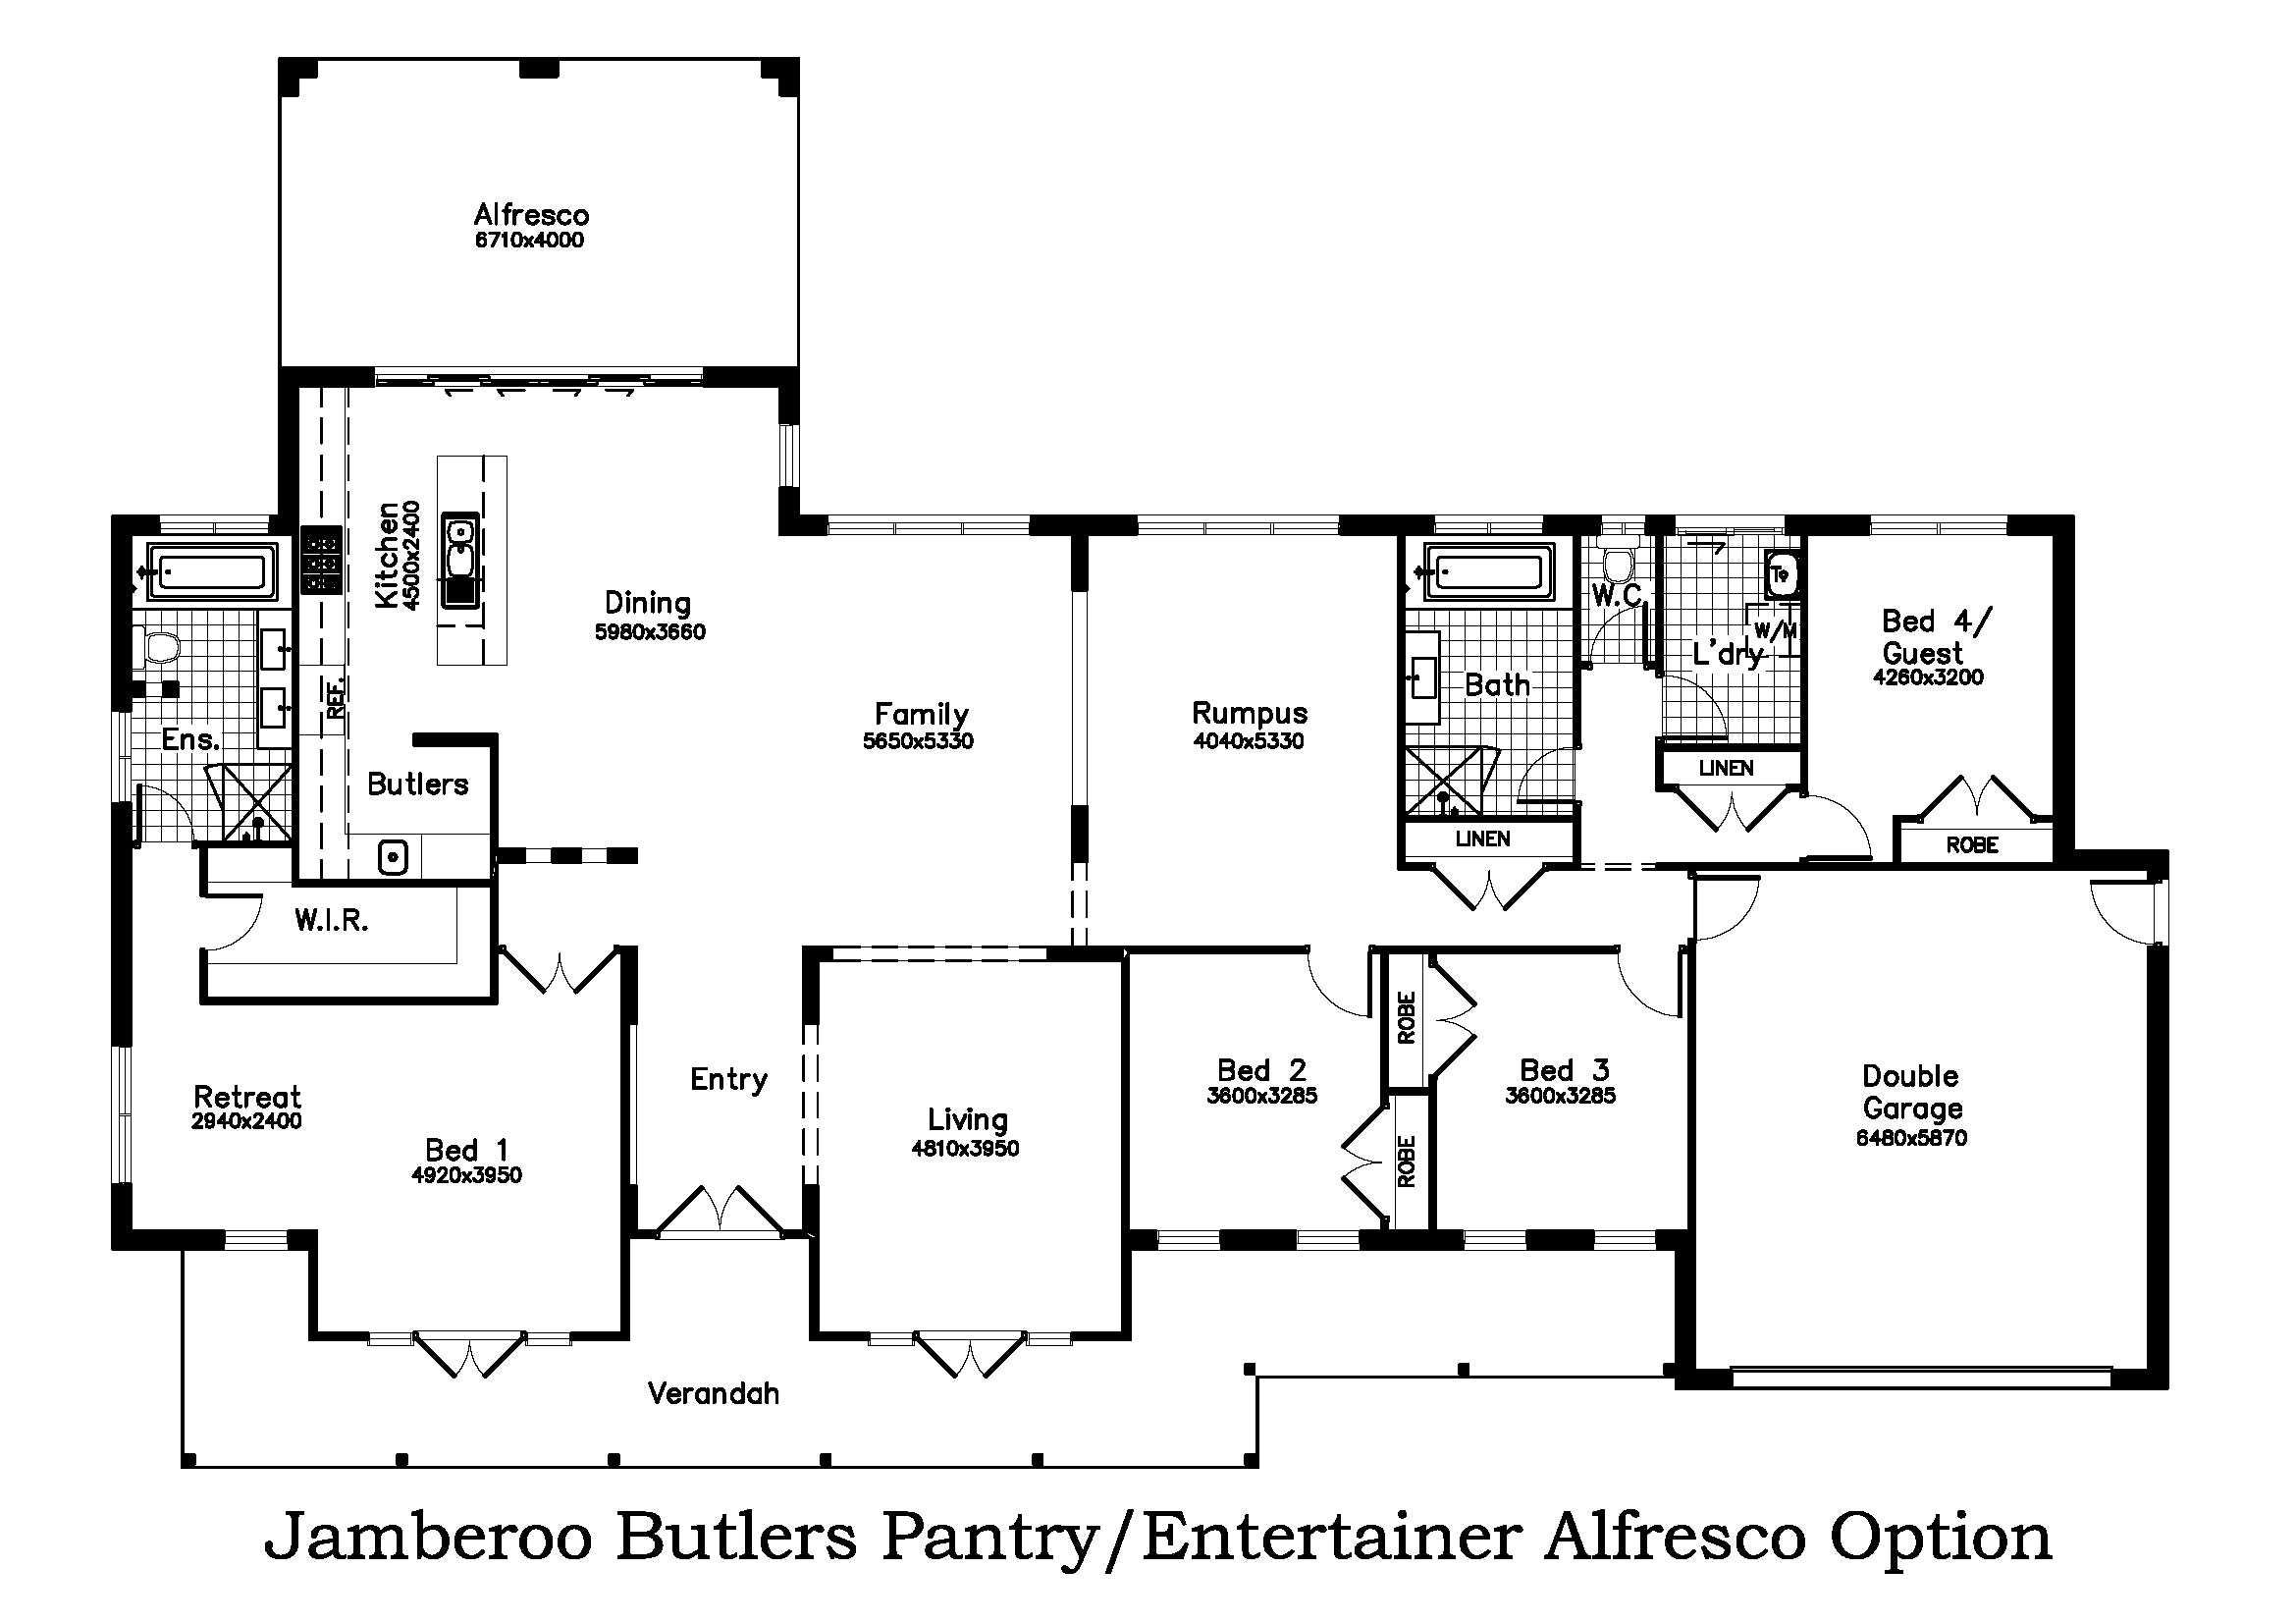 Butler Entertainer Alfresco Option